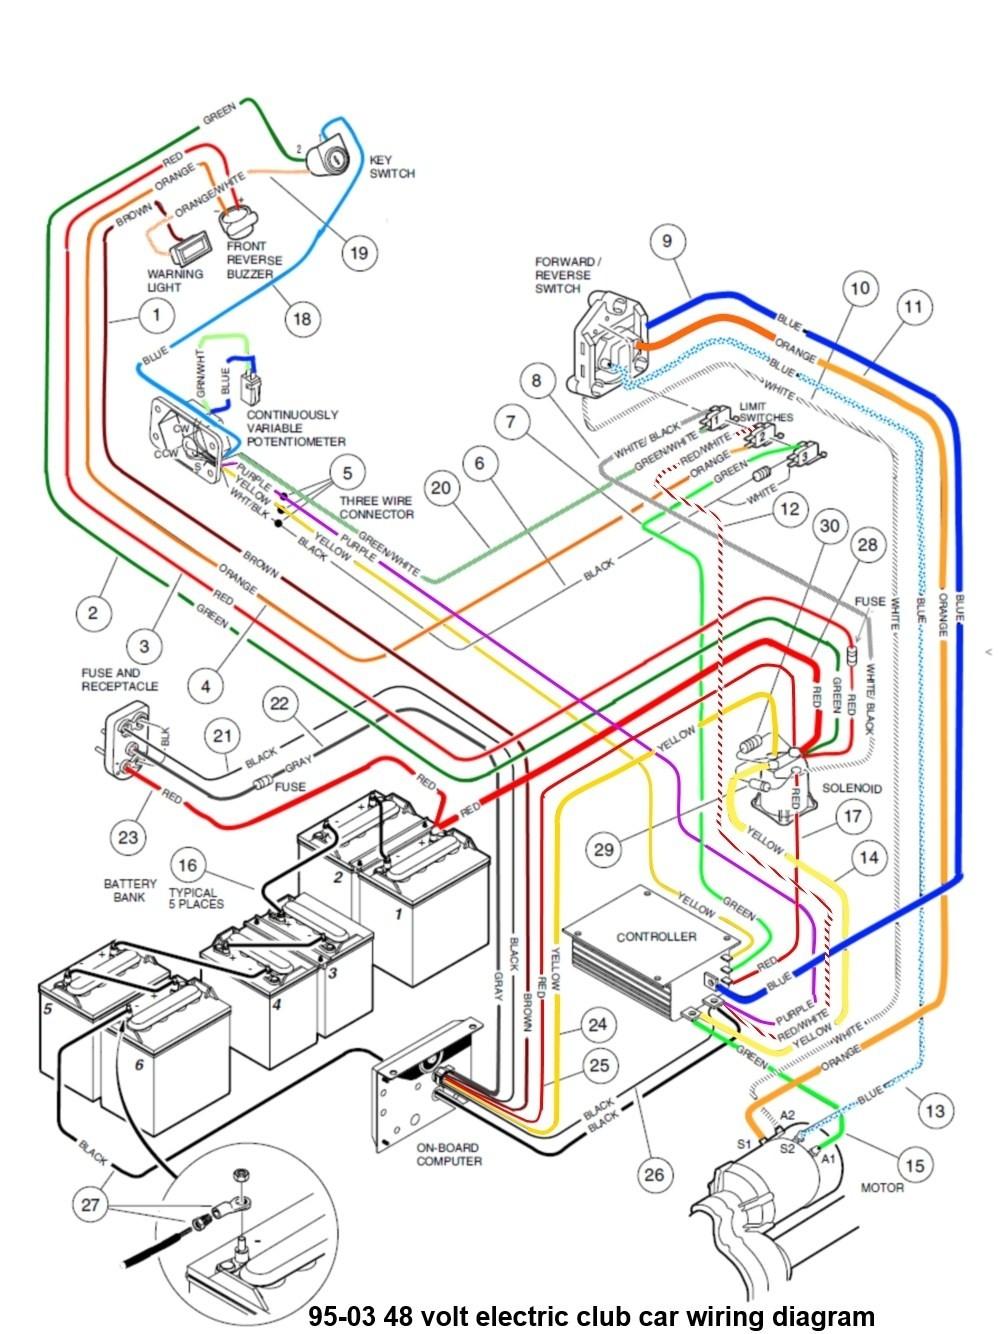 club car 48 volt wiring diagram Ingersoll Rand Club Car Wiring Diagram And For 1999